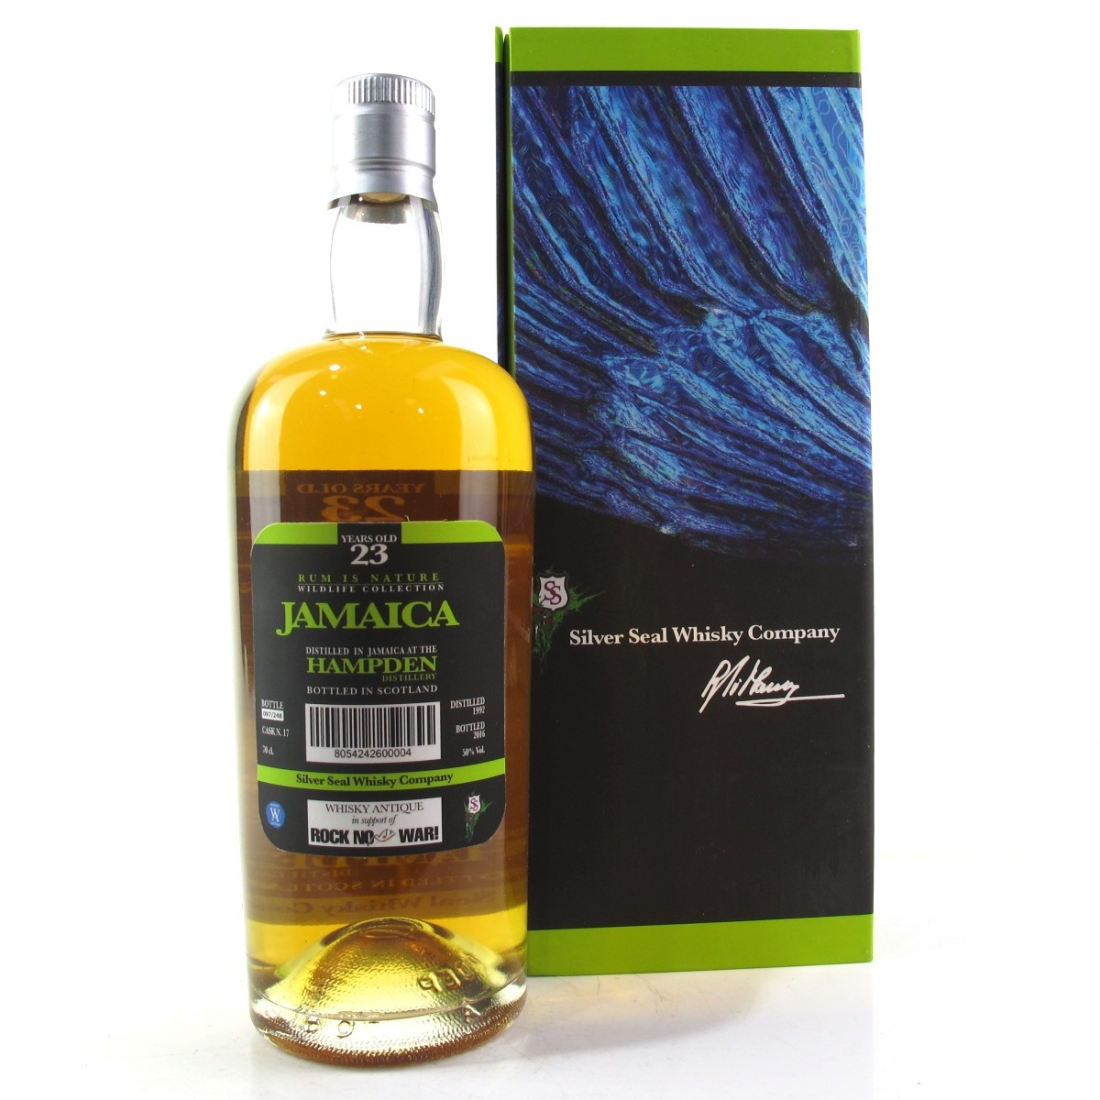 Hampden 1992 Silver Seal 23 Year Old Jamaican Rum